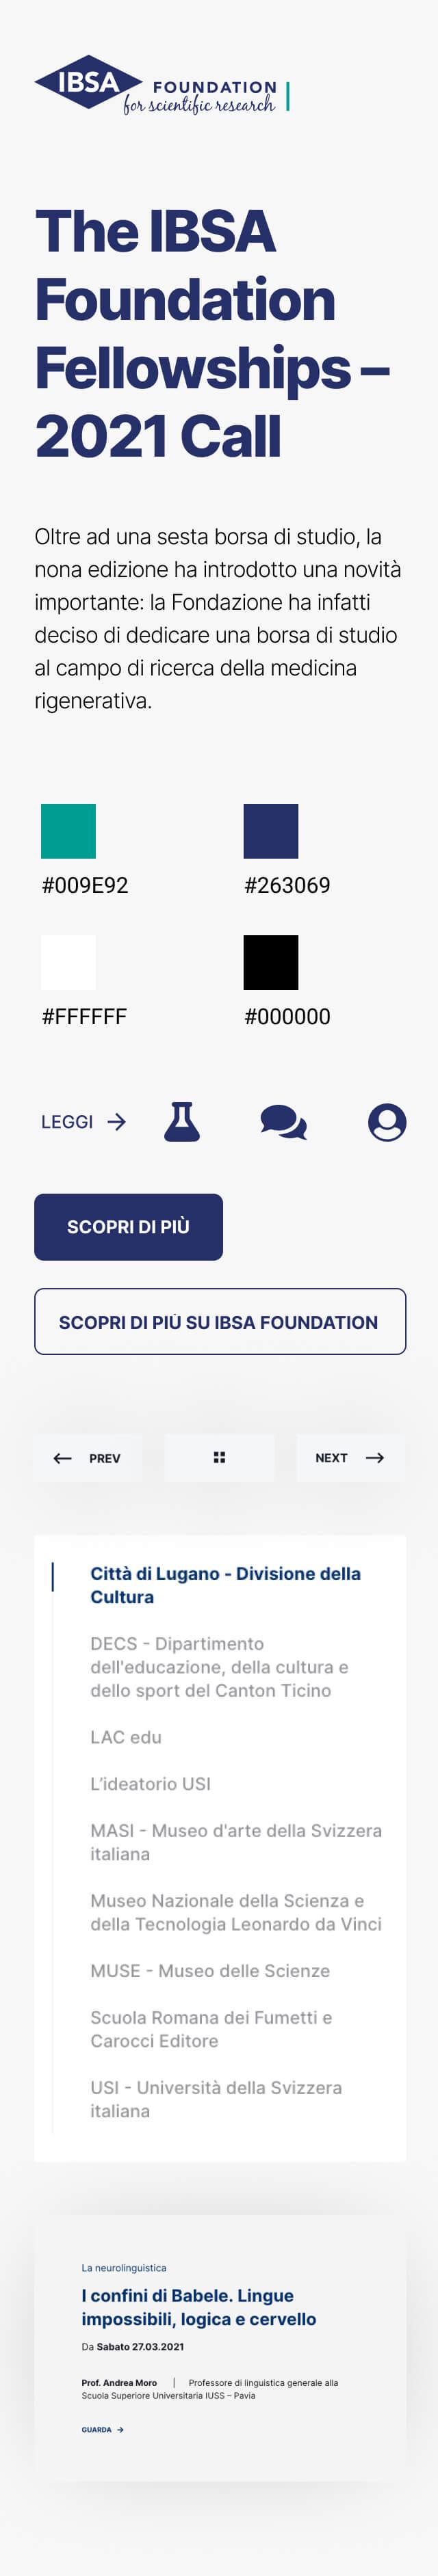 IBSA Foundation elementi grafici